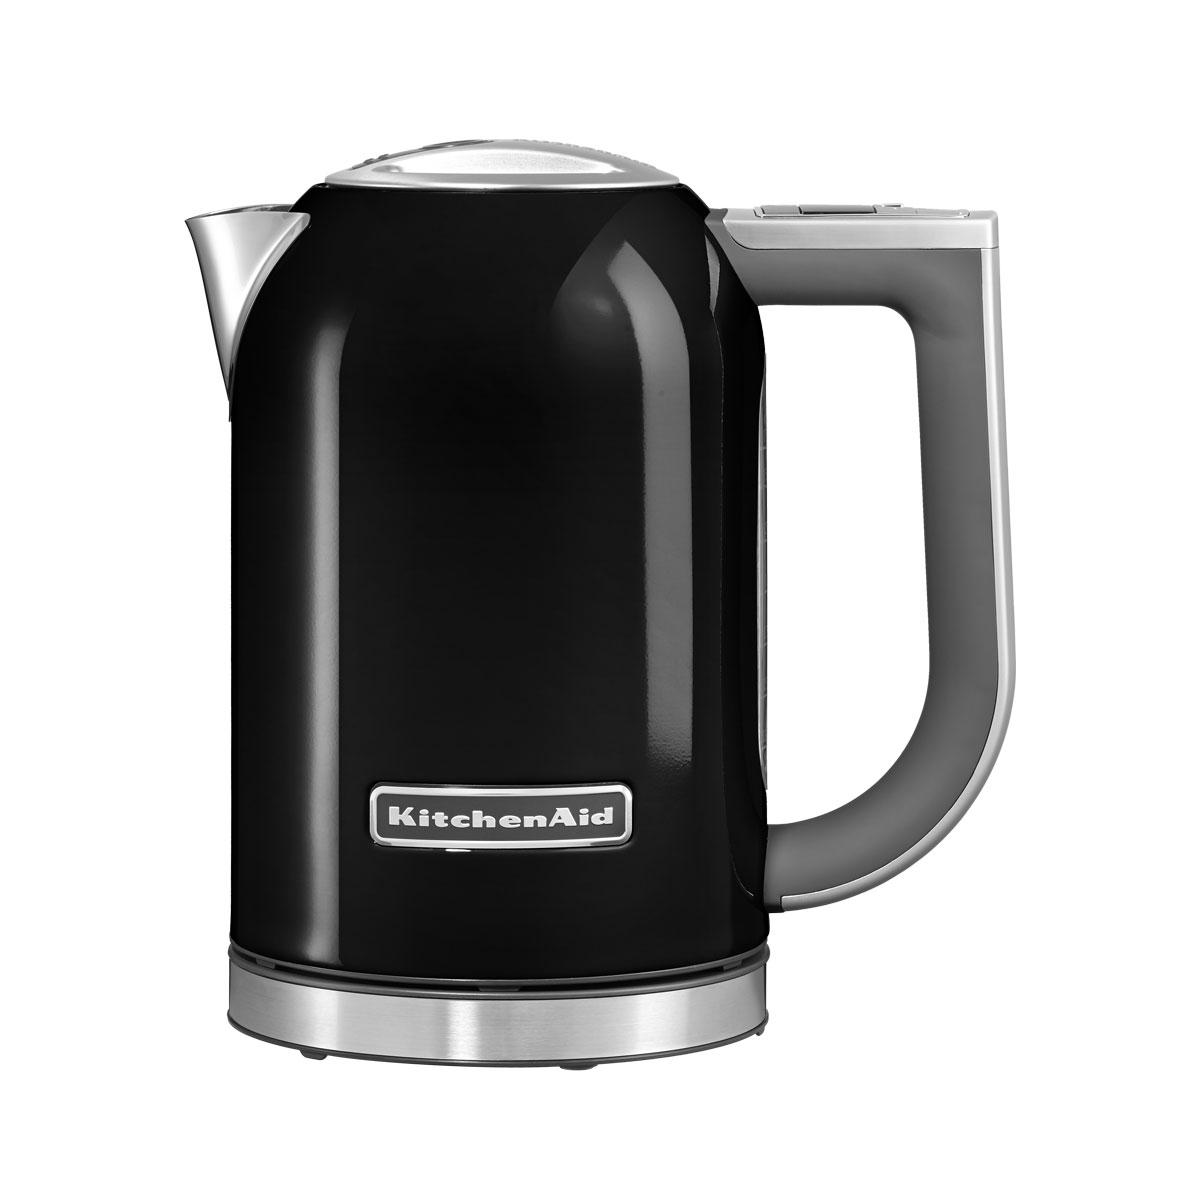 kitchenaid wasserkocher schwarz 7l kettle. Black Bedroom Furniture Sets. Home Design Ideas